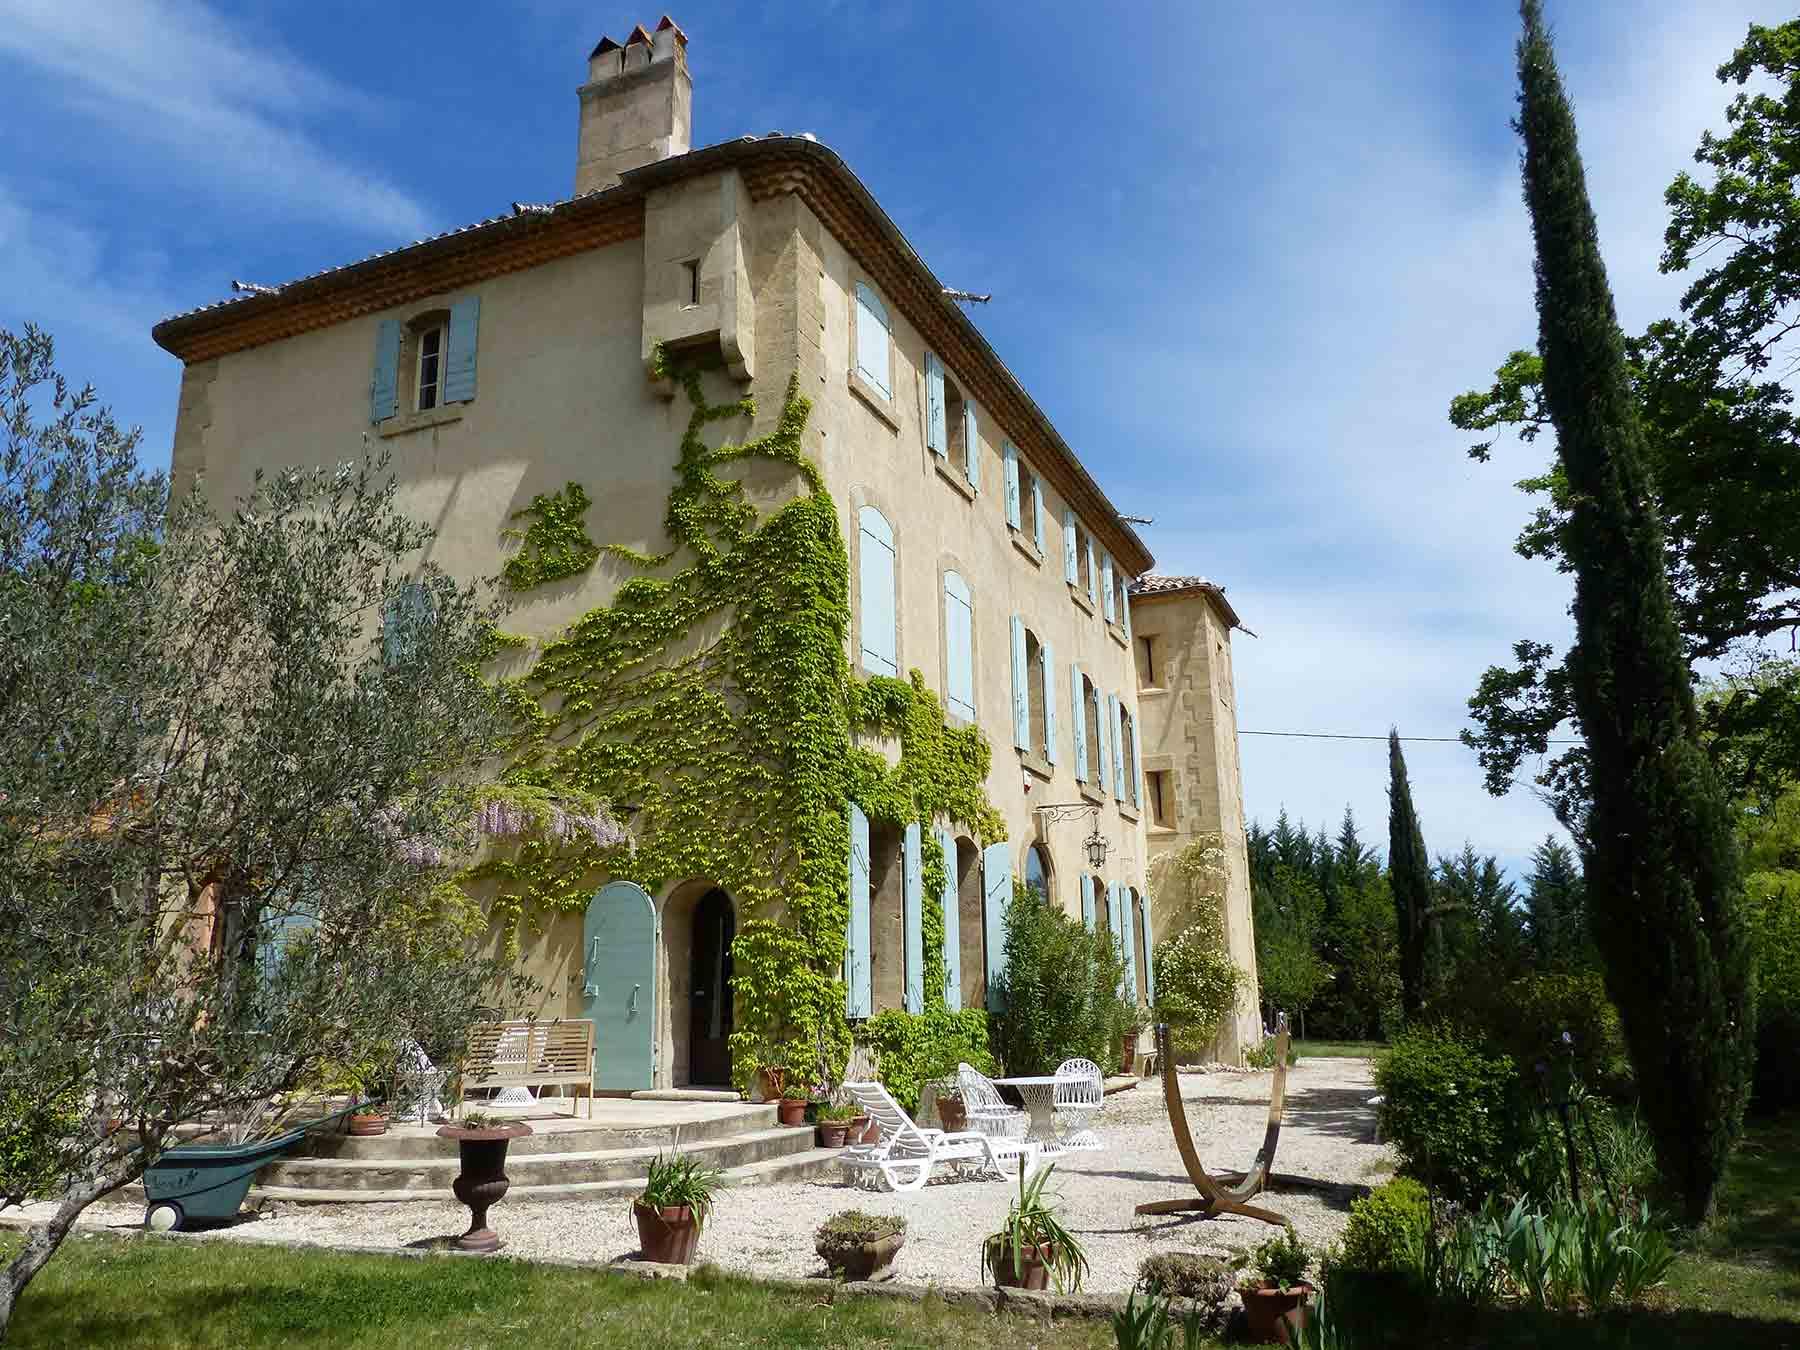 Aix-en-Provence - France - House , 13 rooms, 9 bedrooms - Slideshow Picture 1